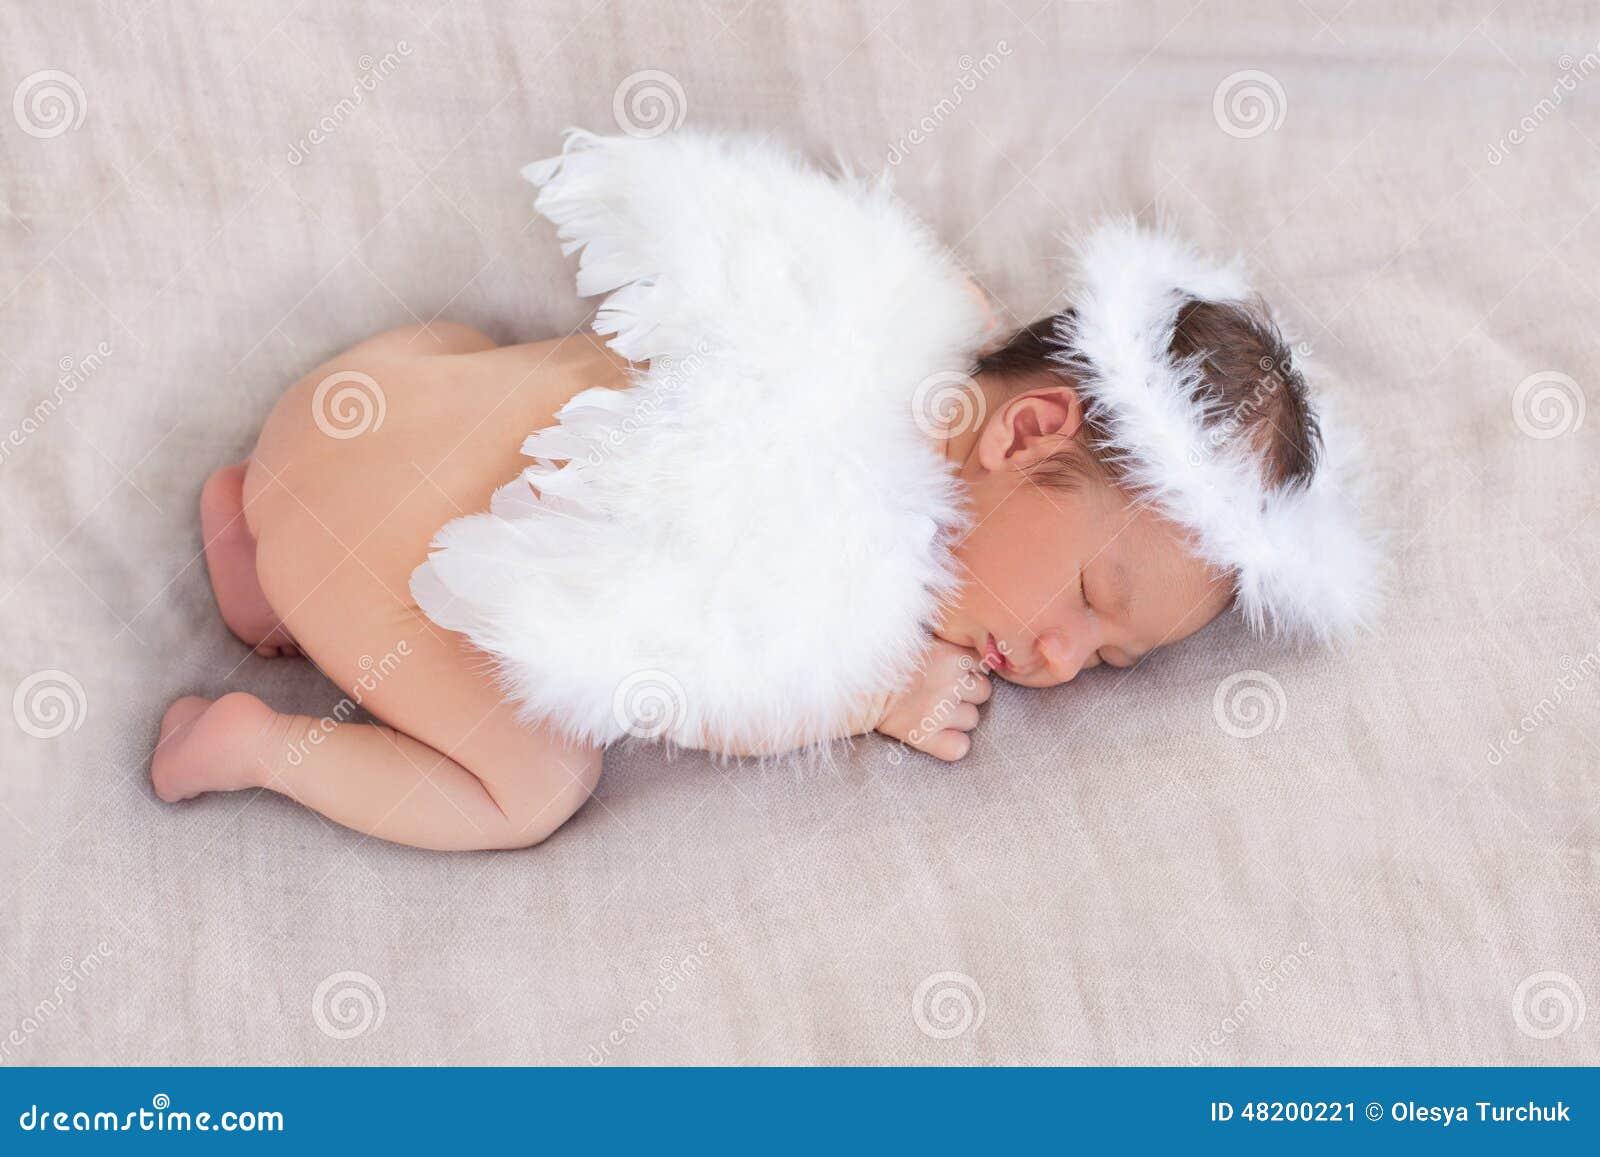 Cute Sleeping Newborn Angel S Character Stock Image